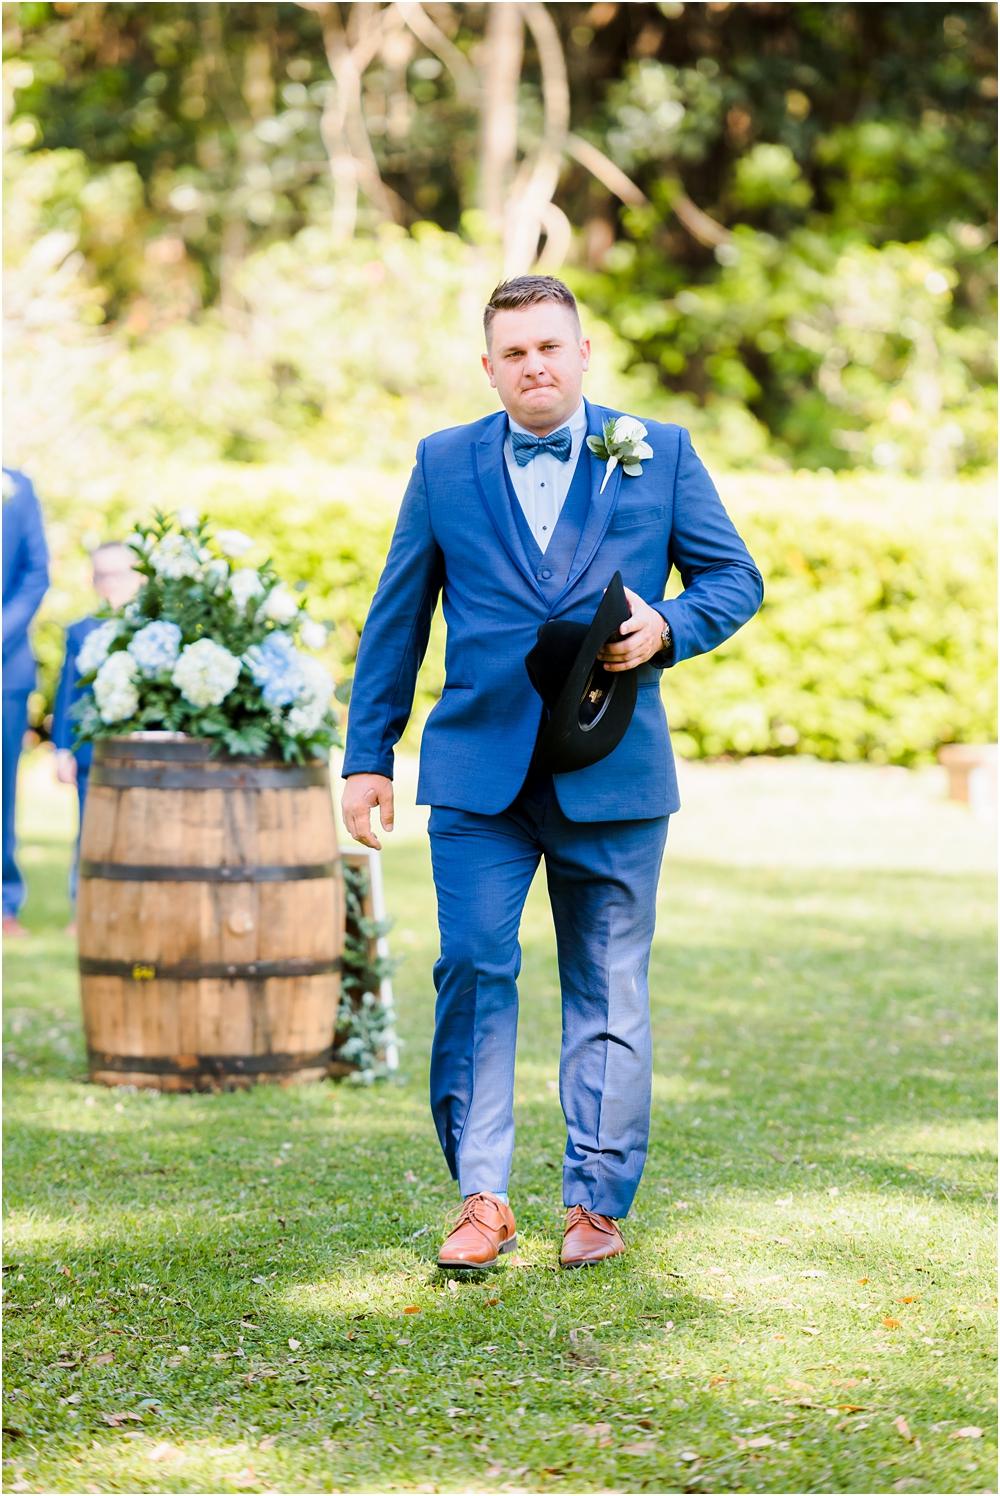 eden-gardens-walton-county-florida-wedding-kiersten-stevenson-photography-49.jpg